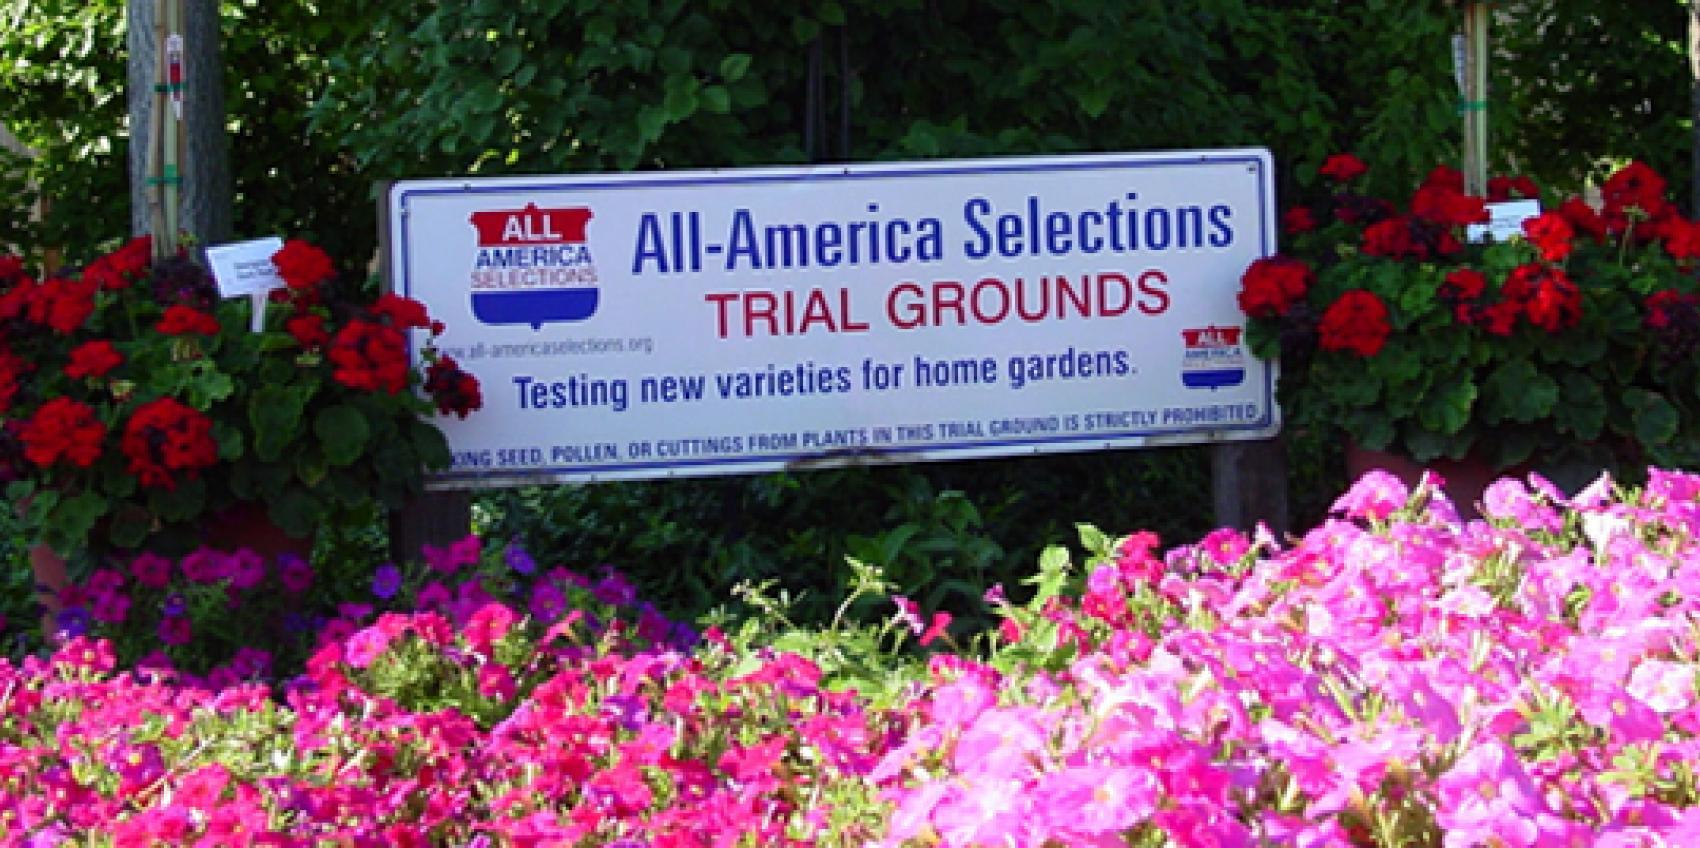 All America Selections National Garden Bureau American Public Gardens Association